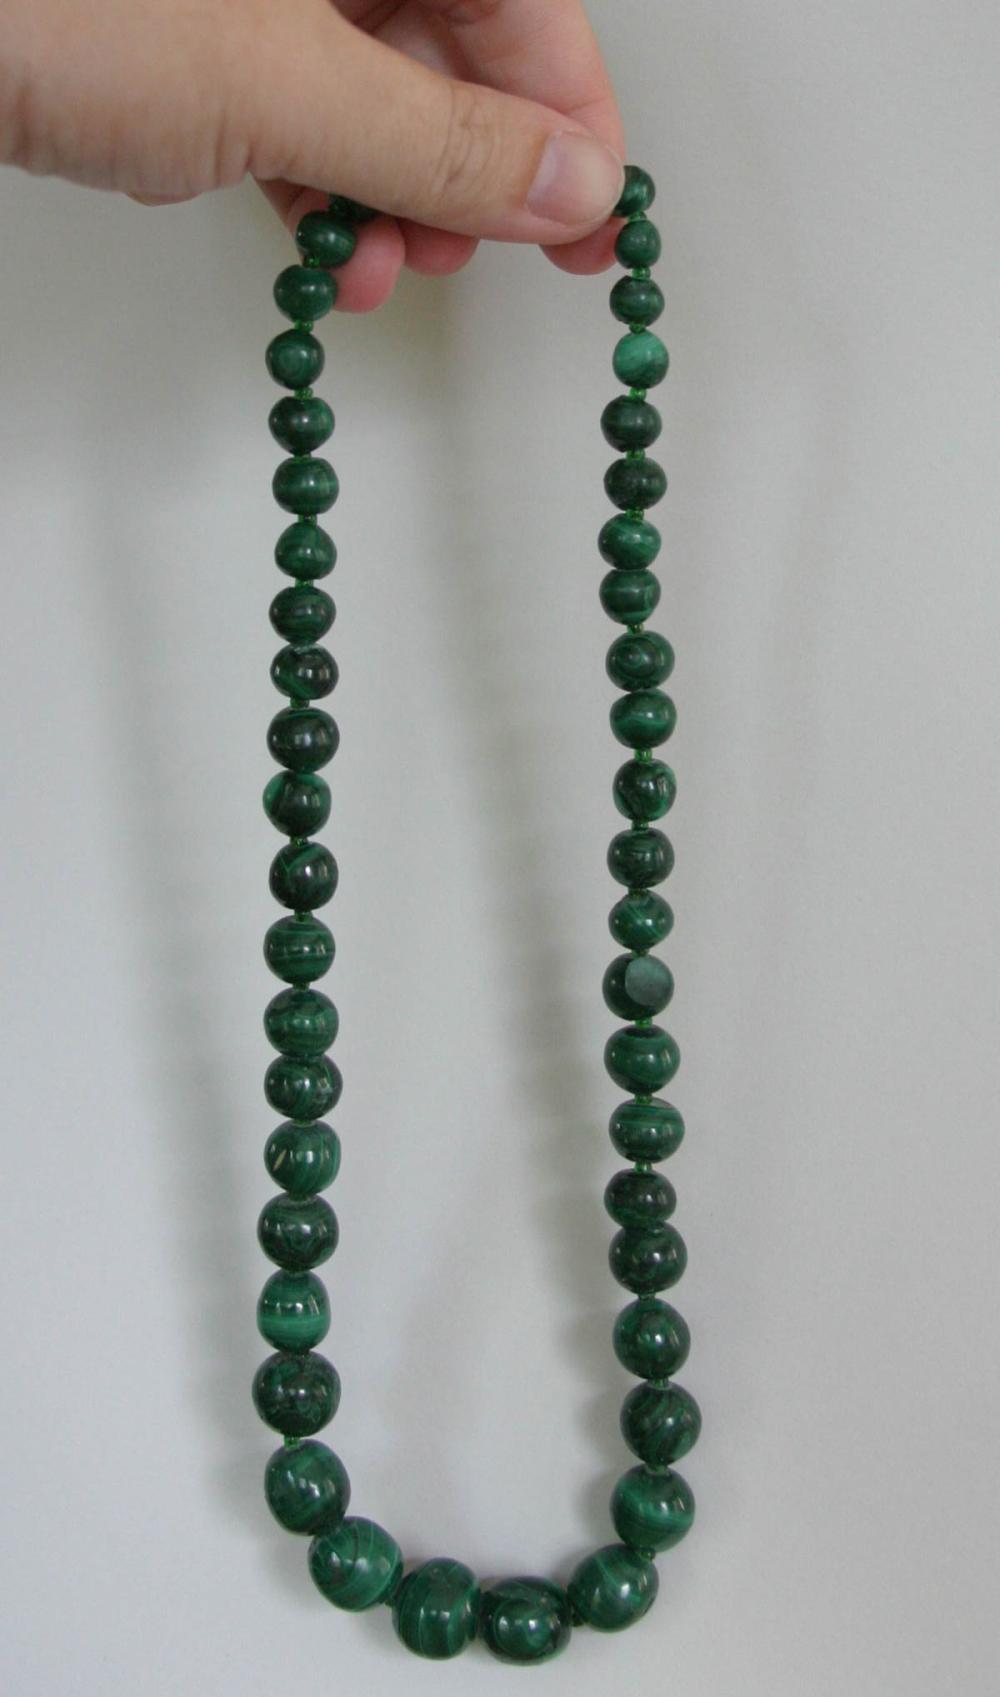 vintage estate jewelry: Malachite necklace